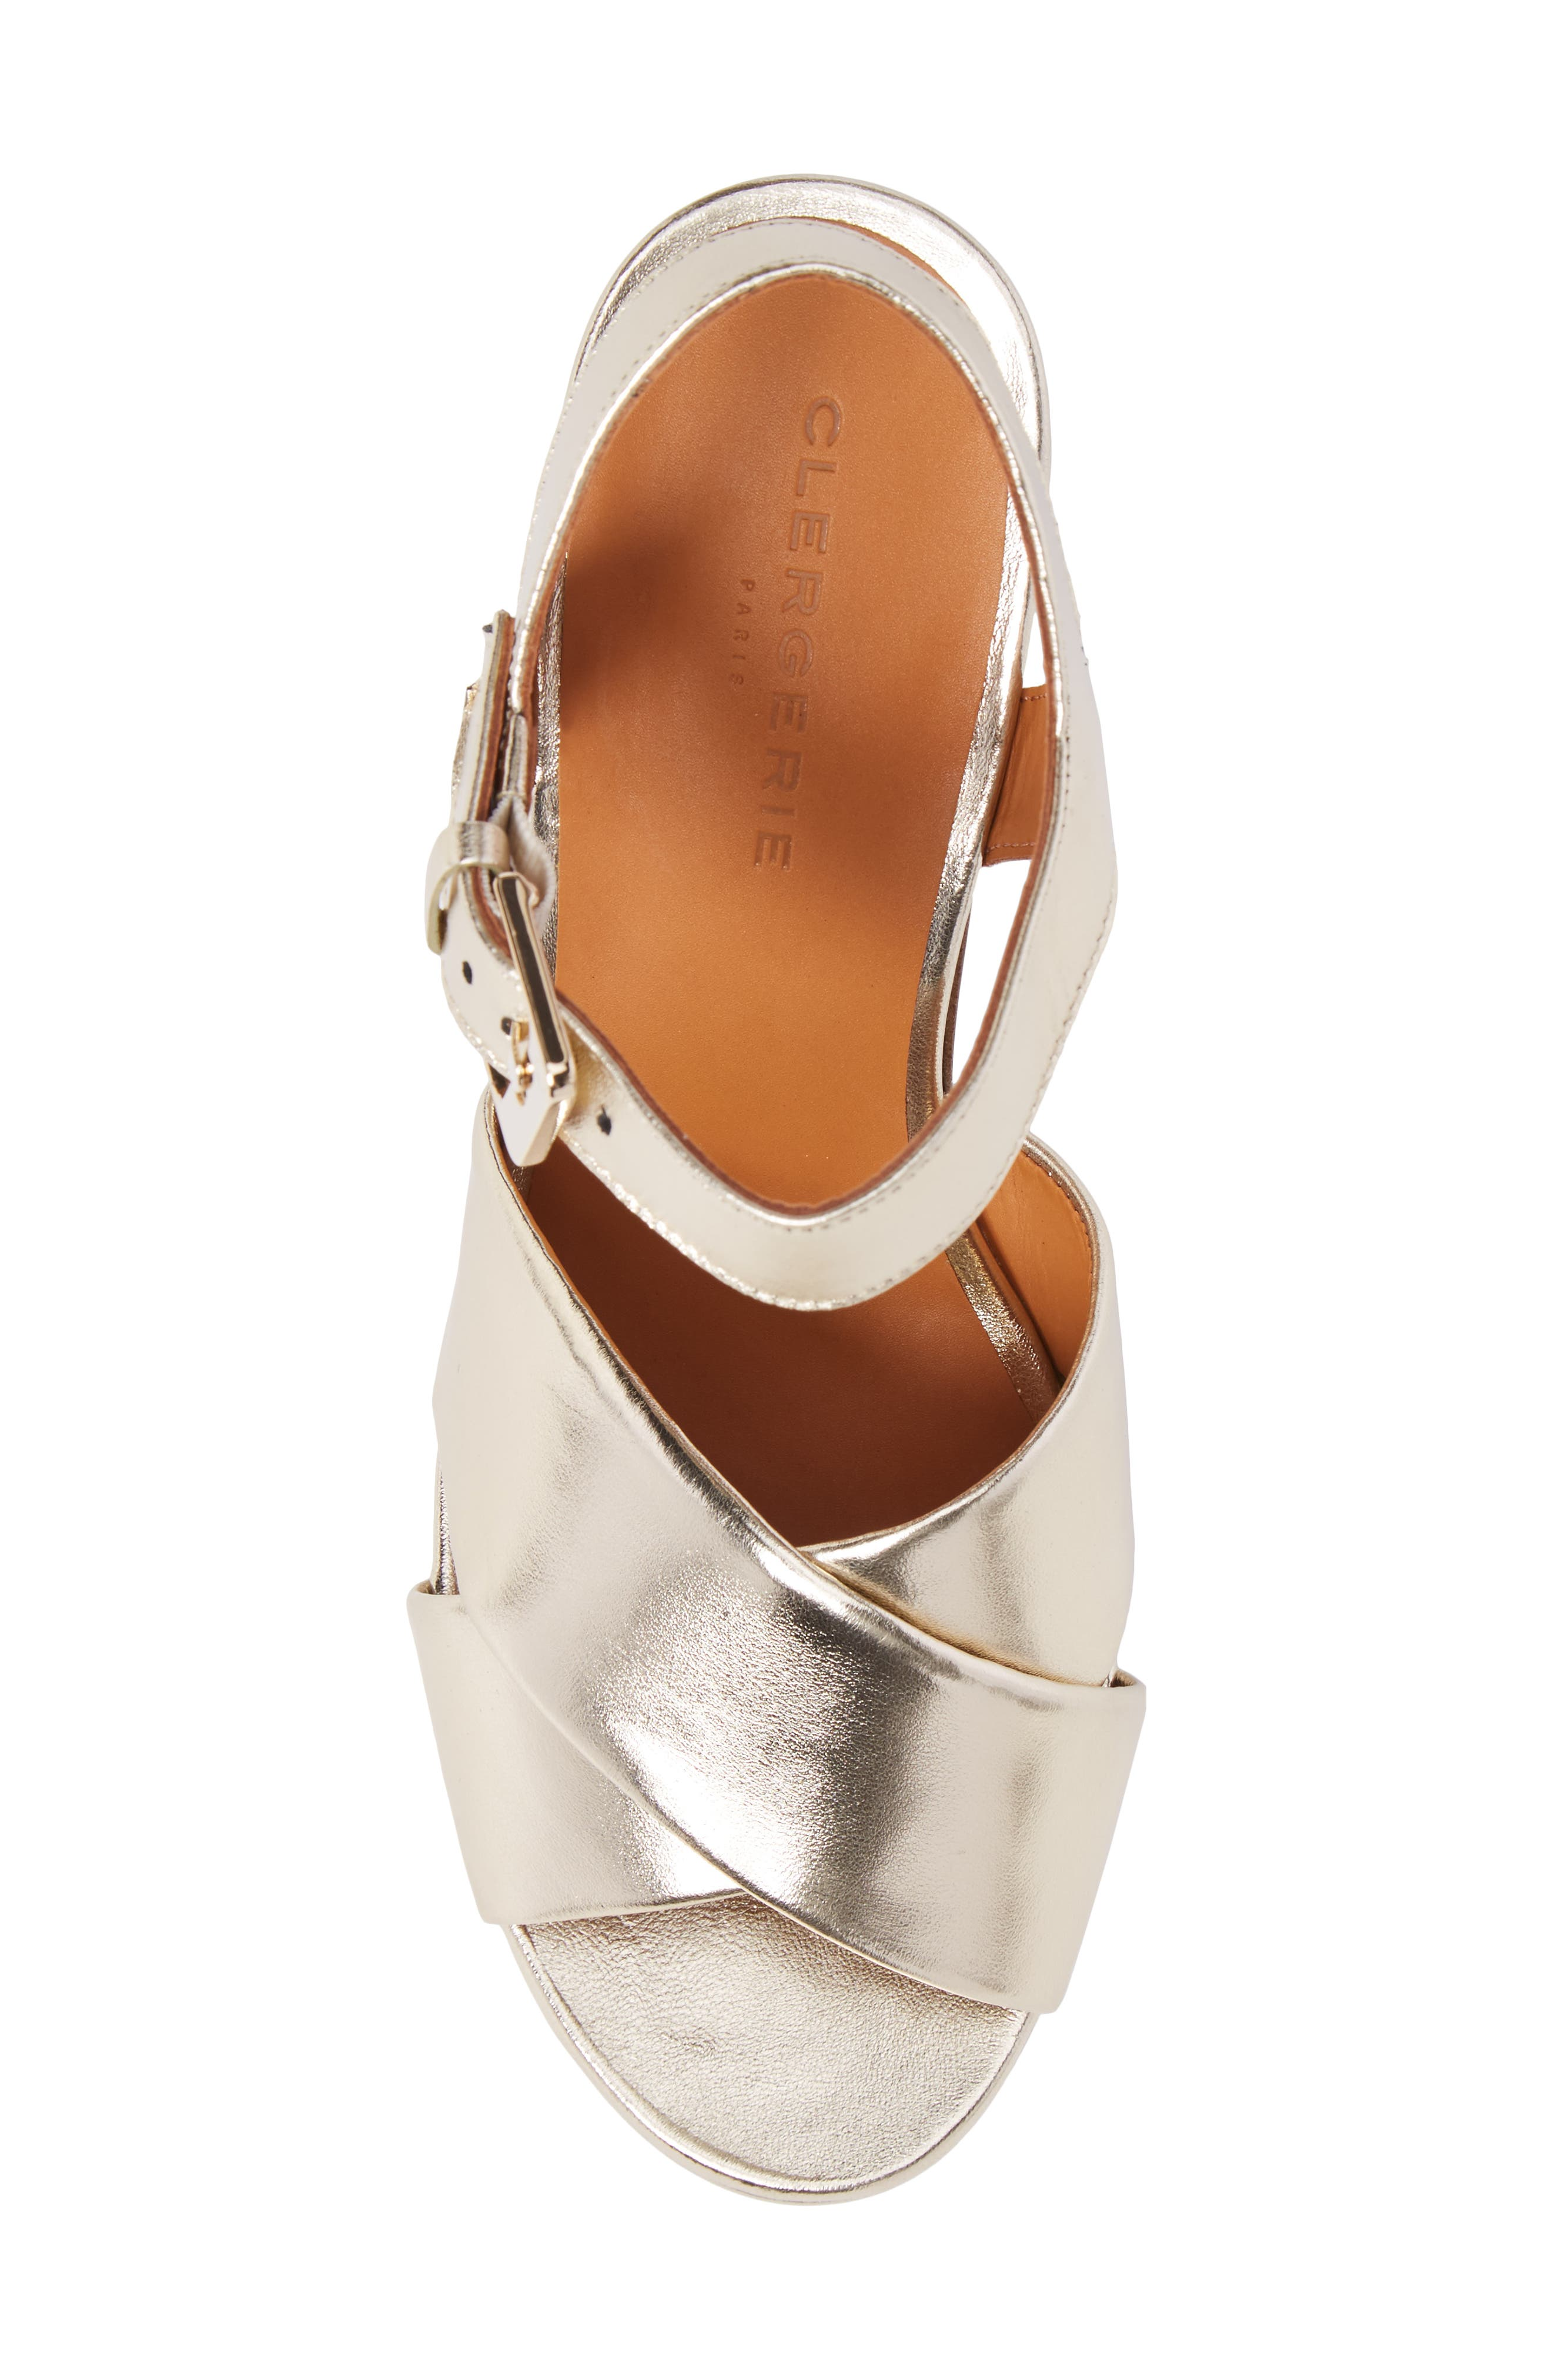 Vianne Ankle Strap Platform Sandal,                             Alternate thumbnail 5, color,                             Metallic Gold